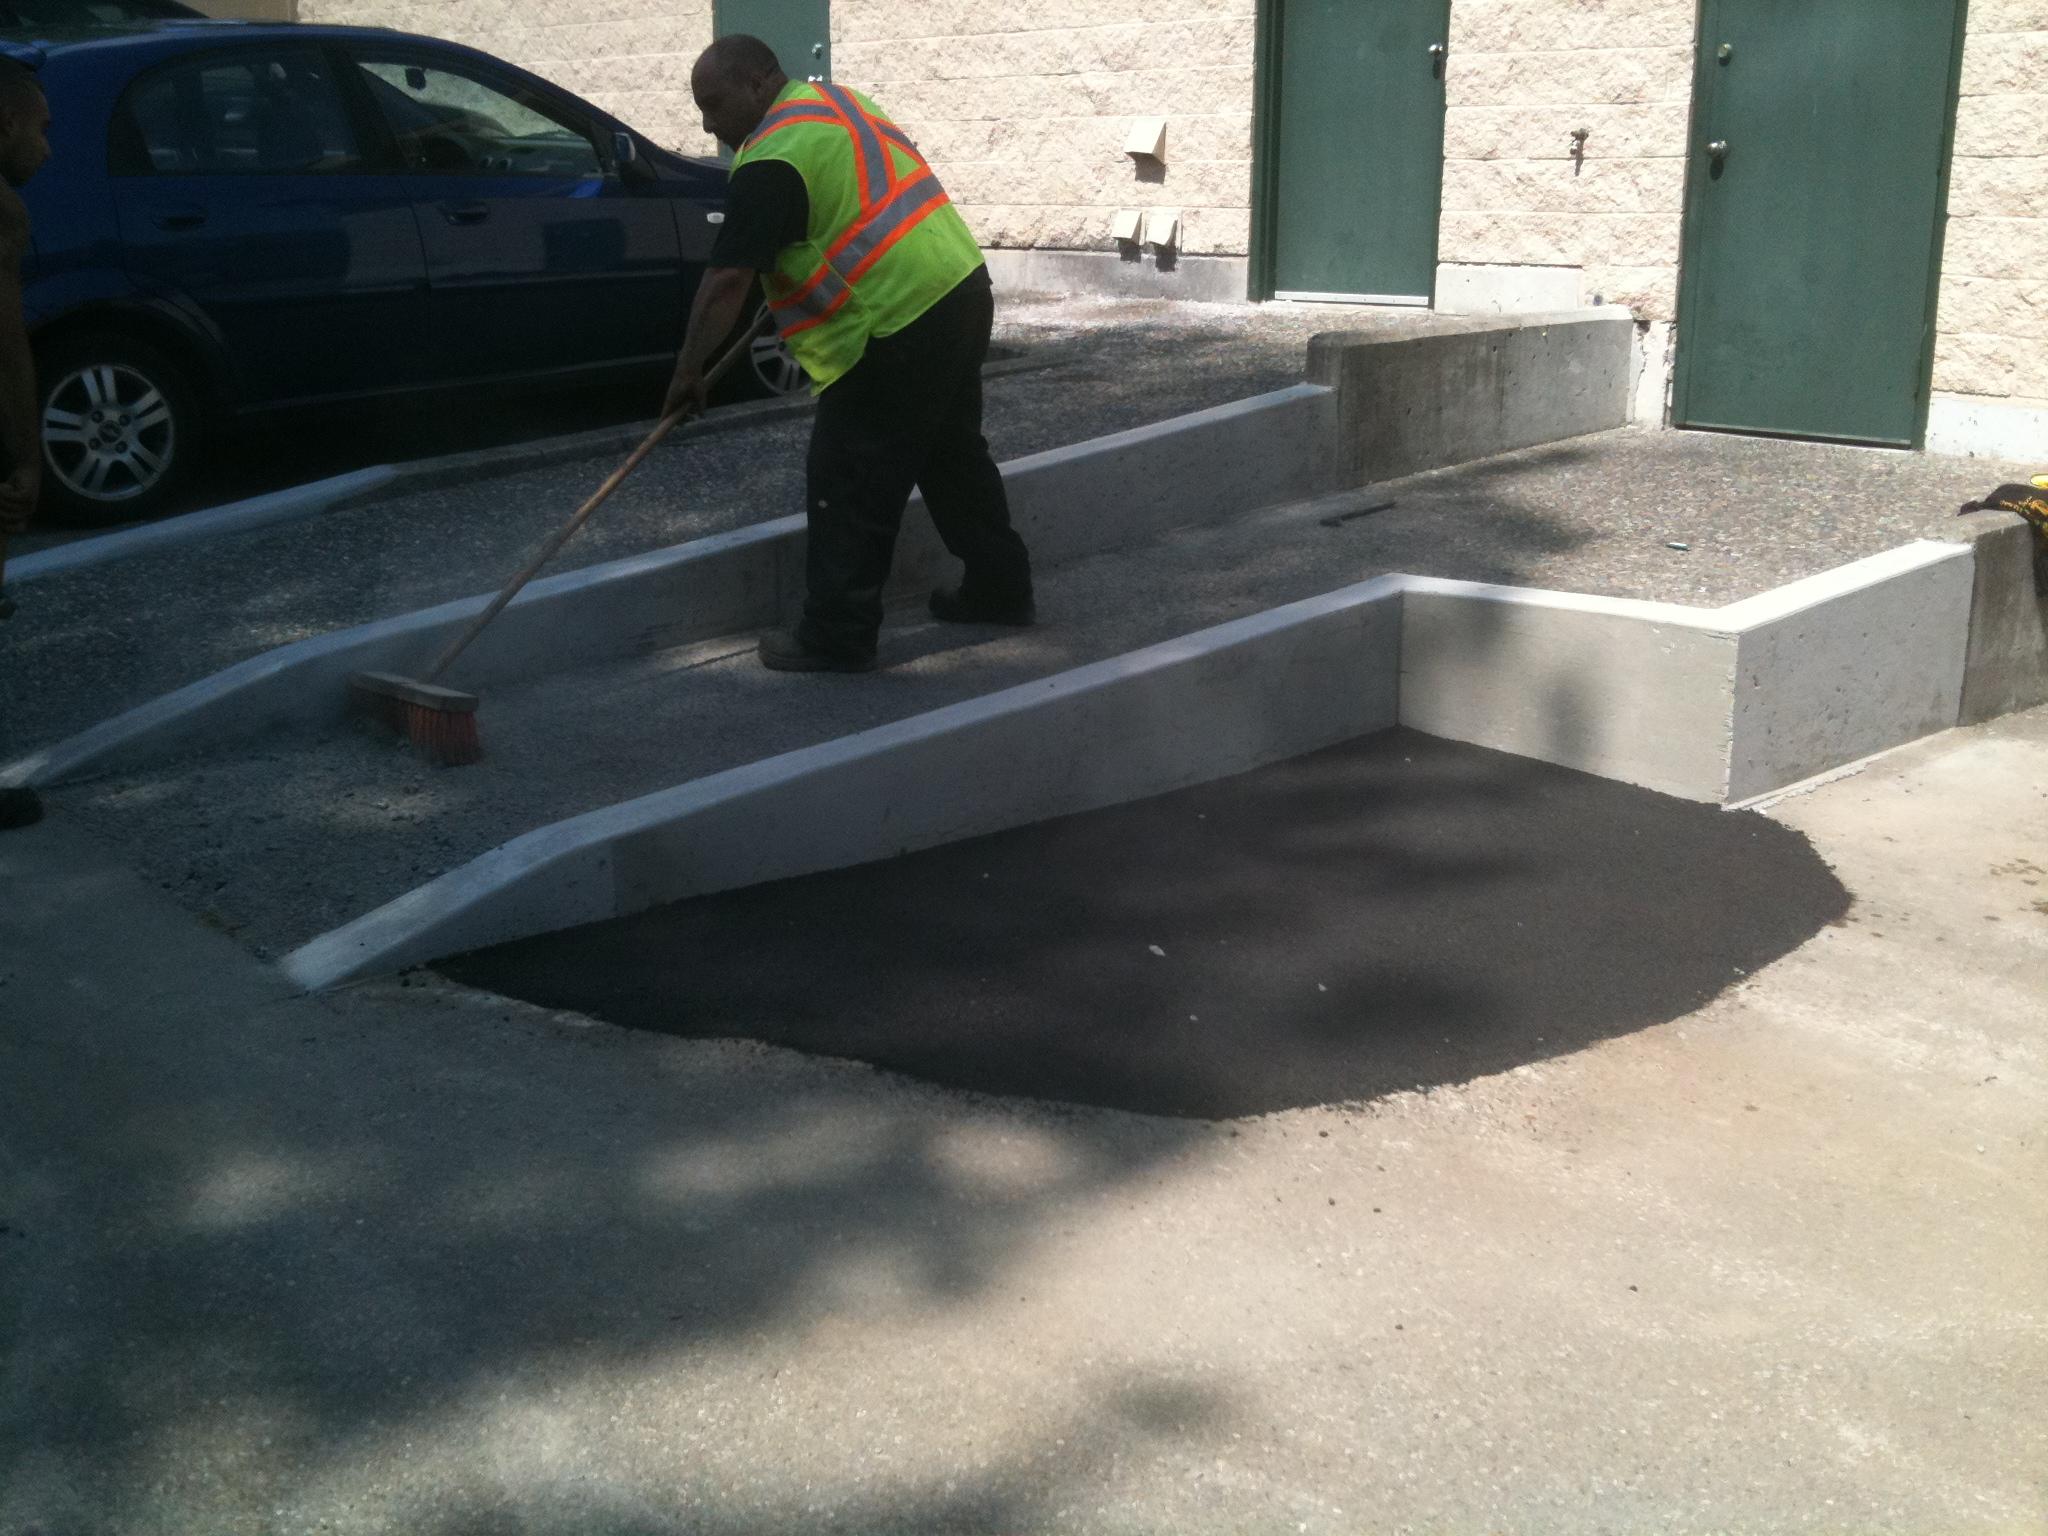 Parking Lots & Maintenance Work